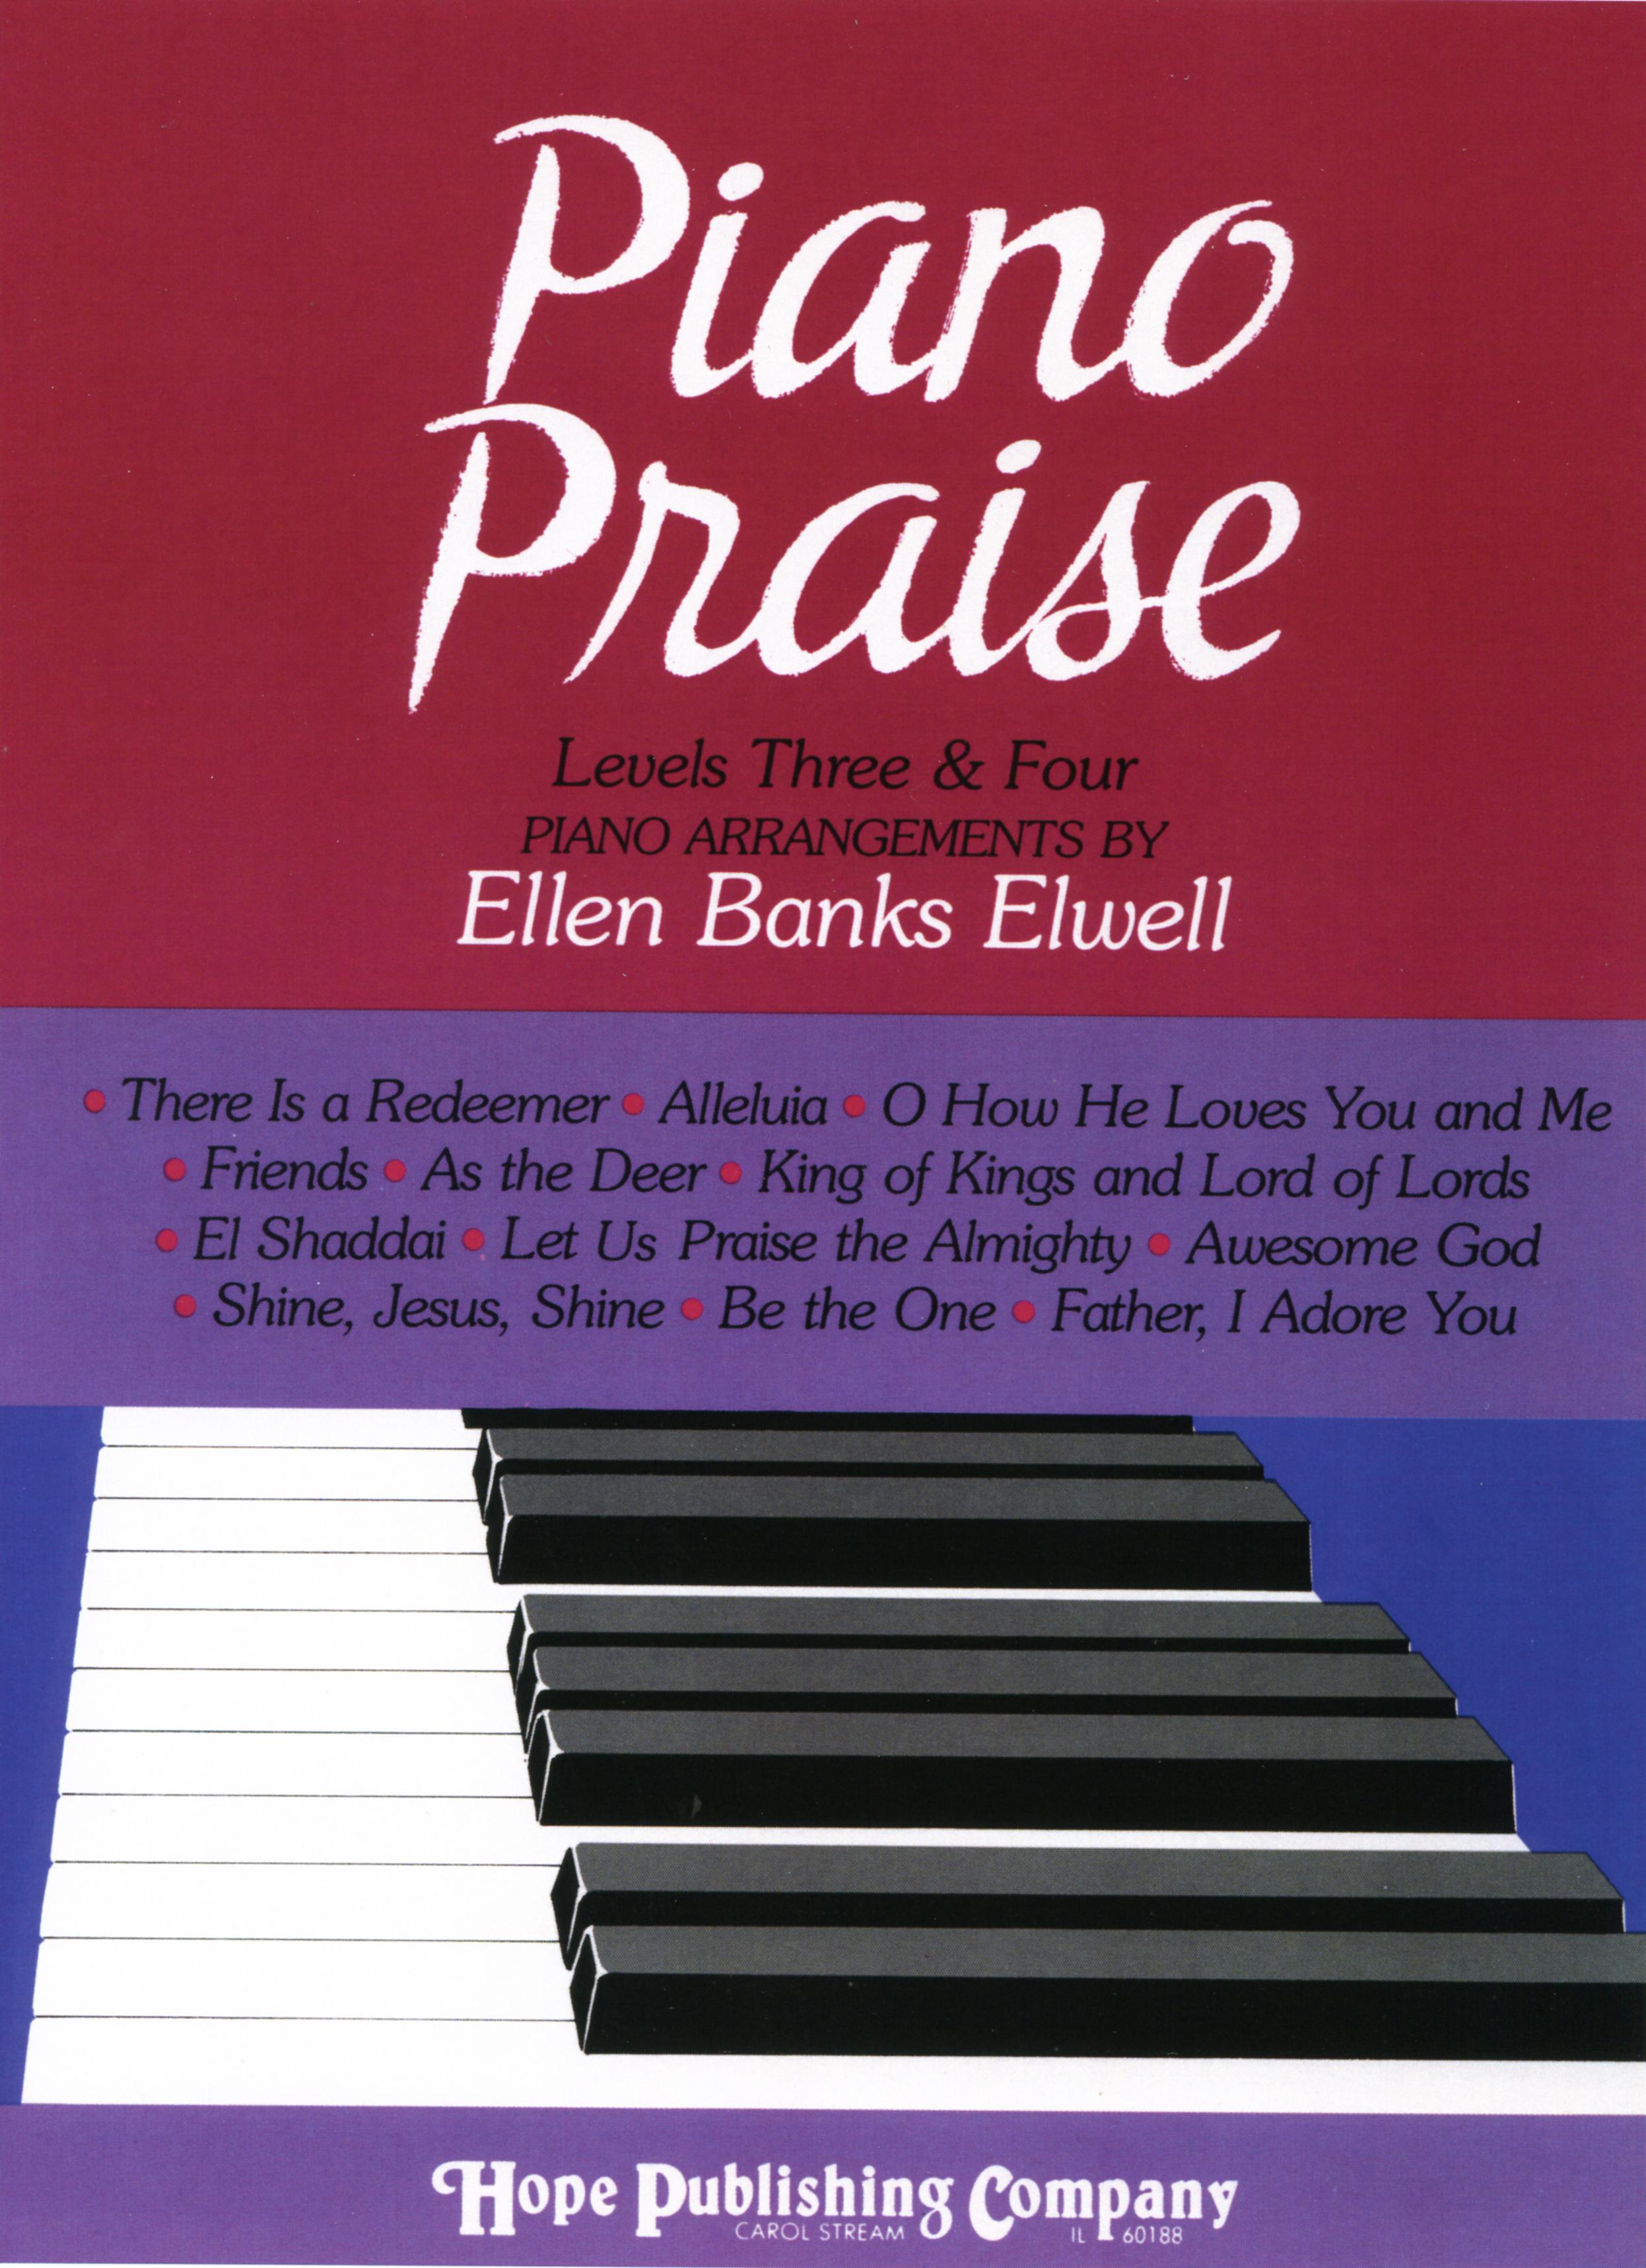 Piano Praise Cover Image